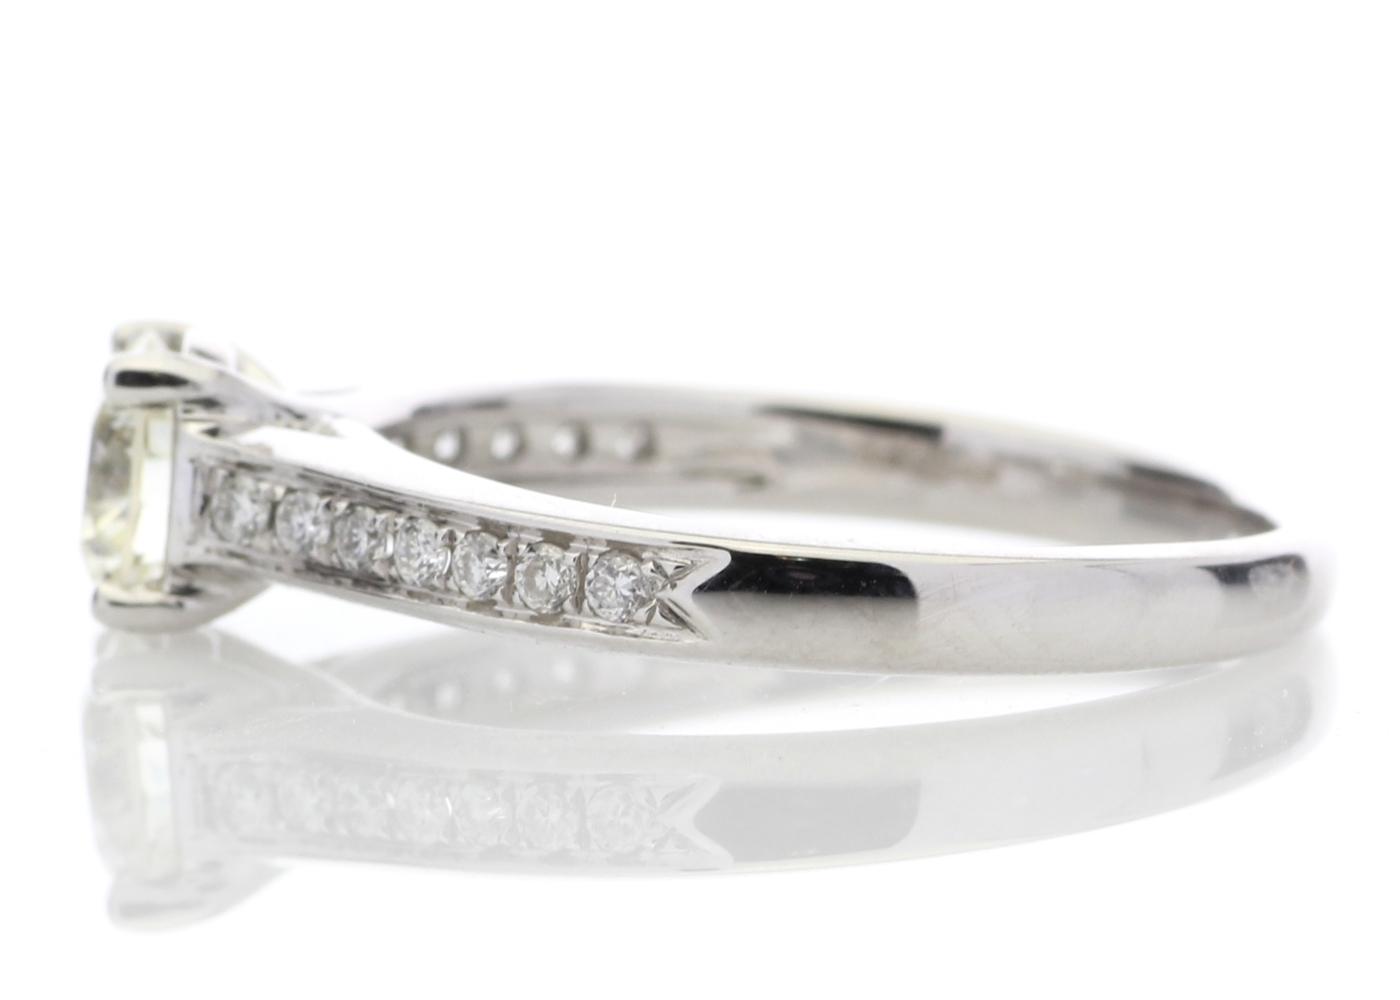 18ct White Gold Single Stone Claw Set Diamond Ring 0.73 Carats - Image 3 of 4